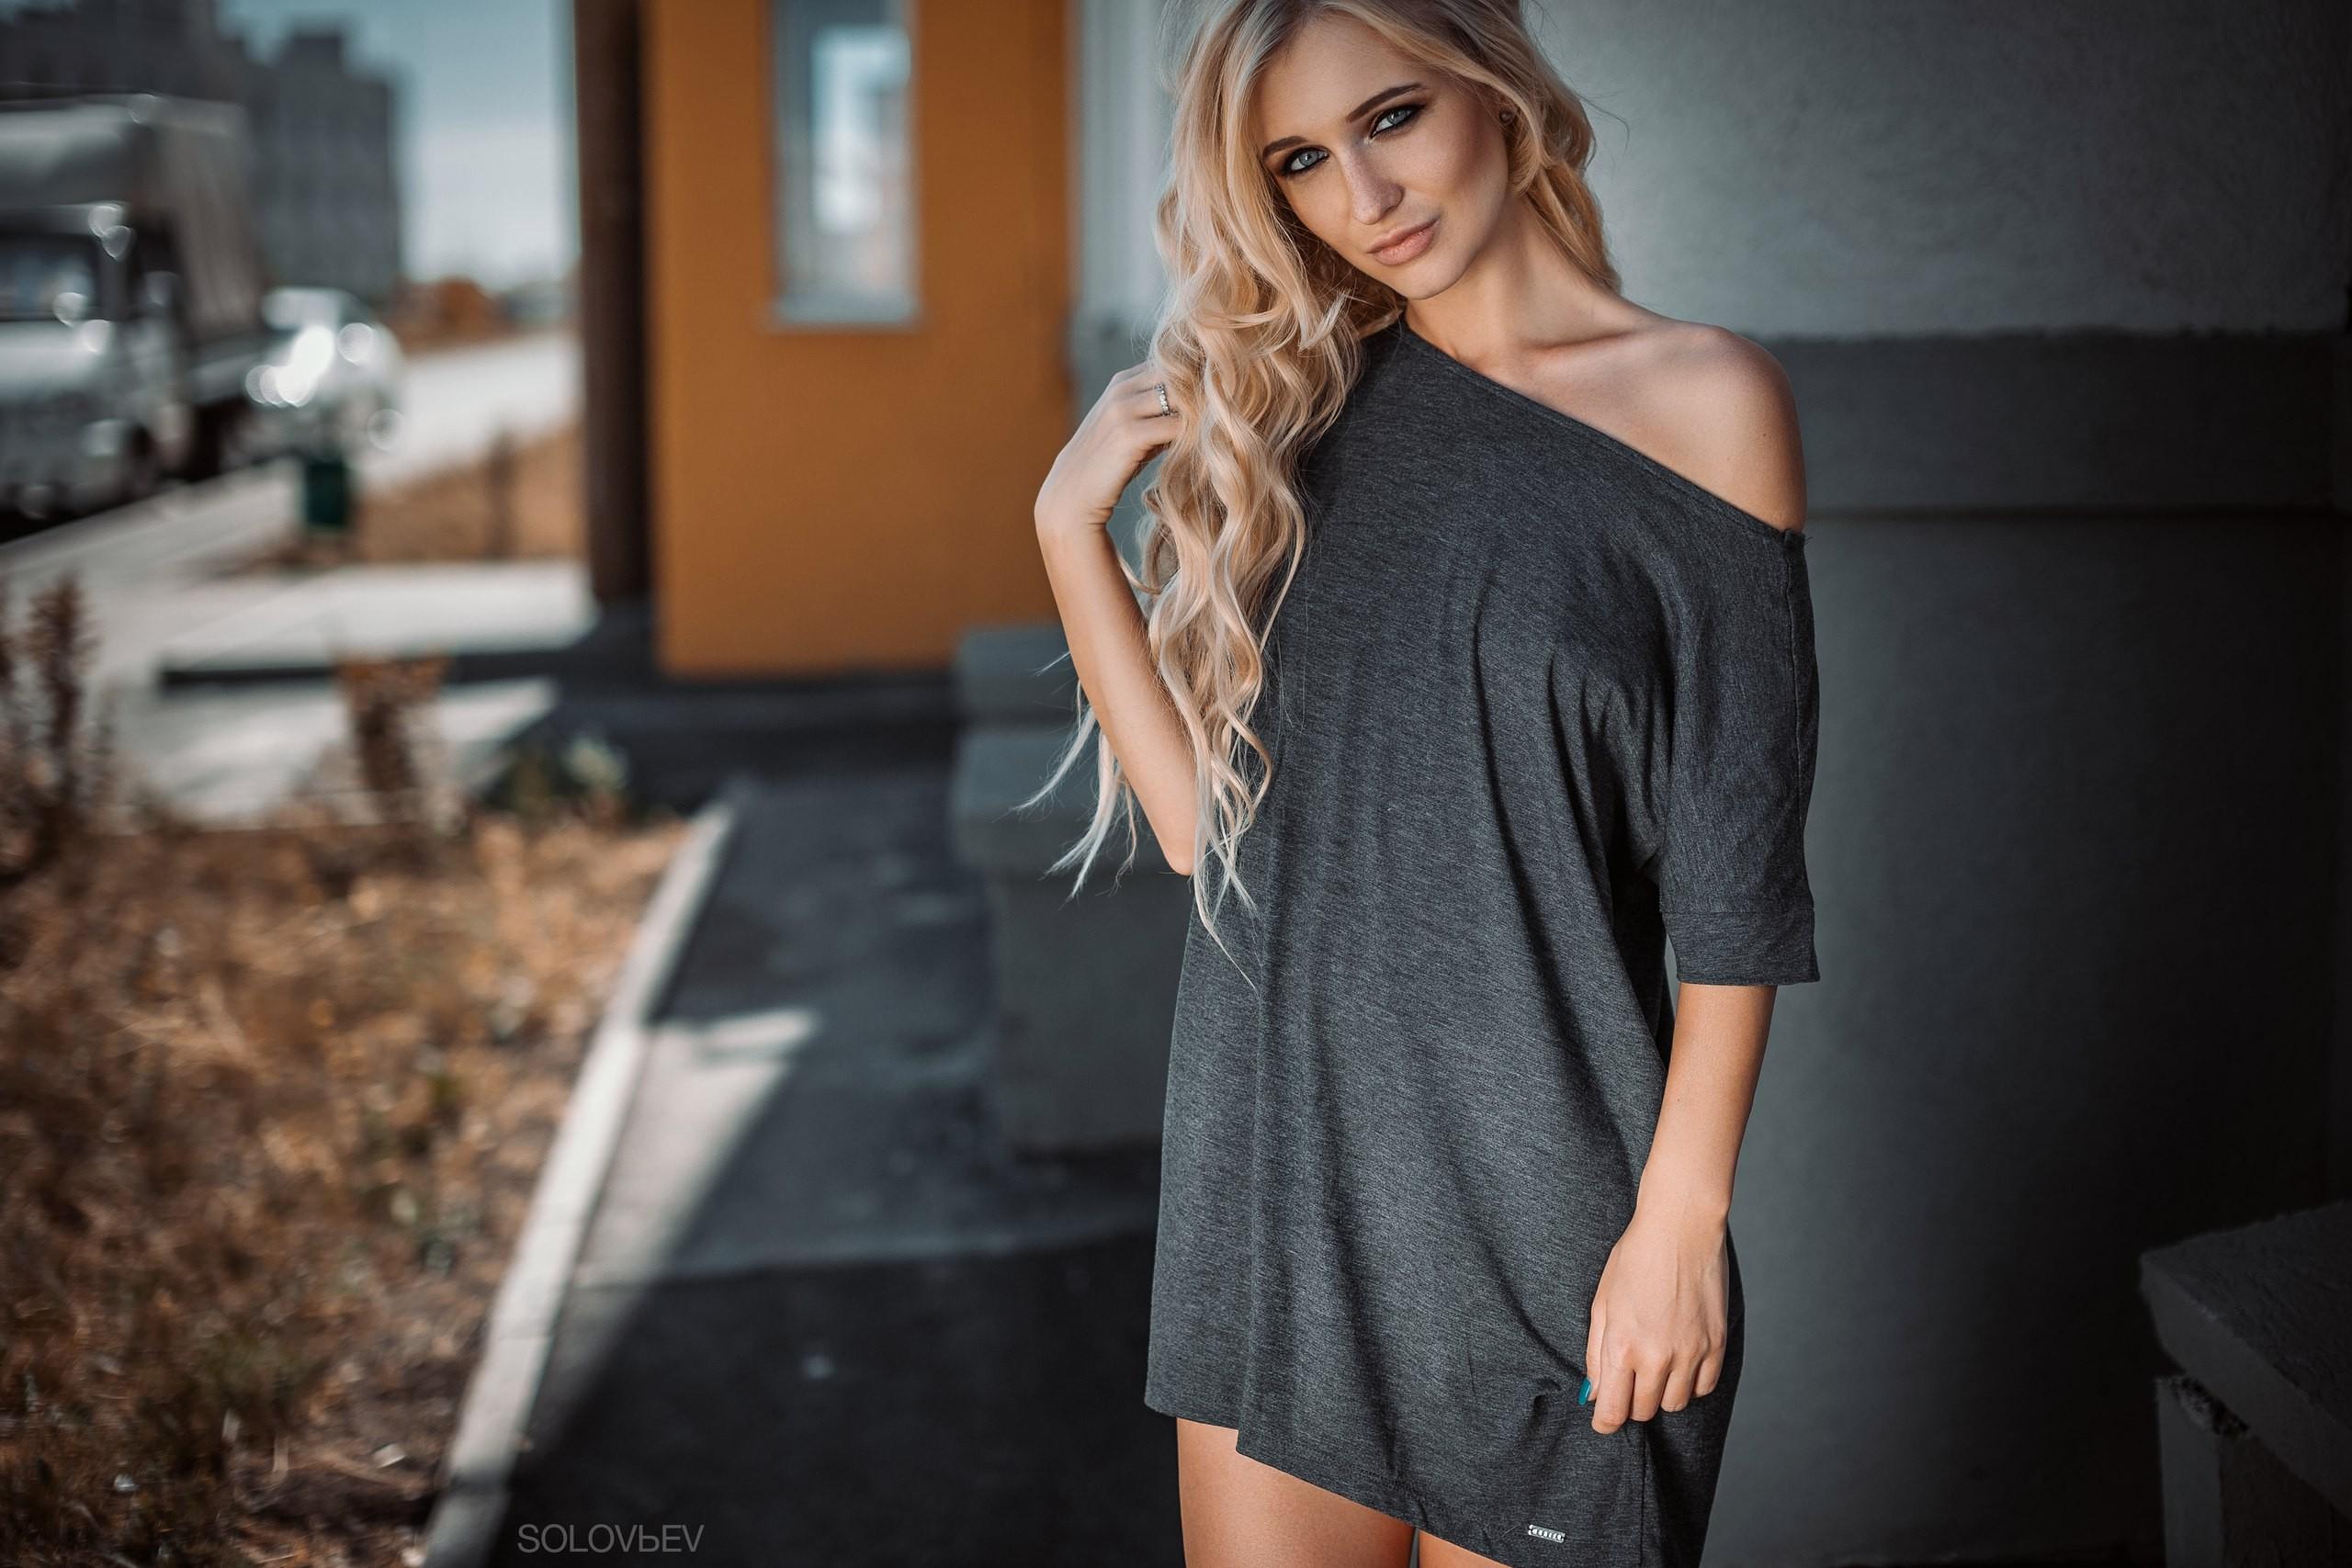 фото девчонок блондинок в футболках инцест сестра